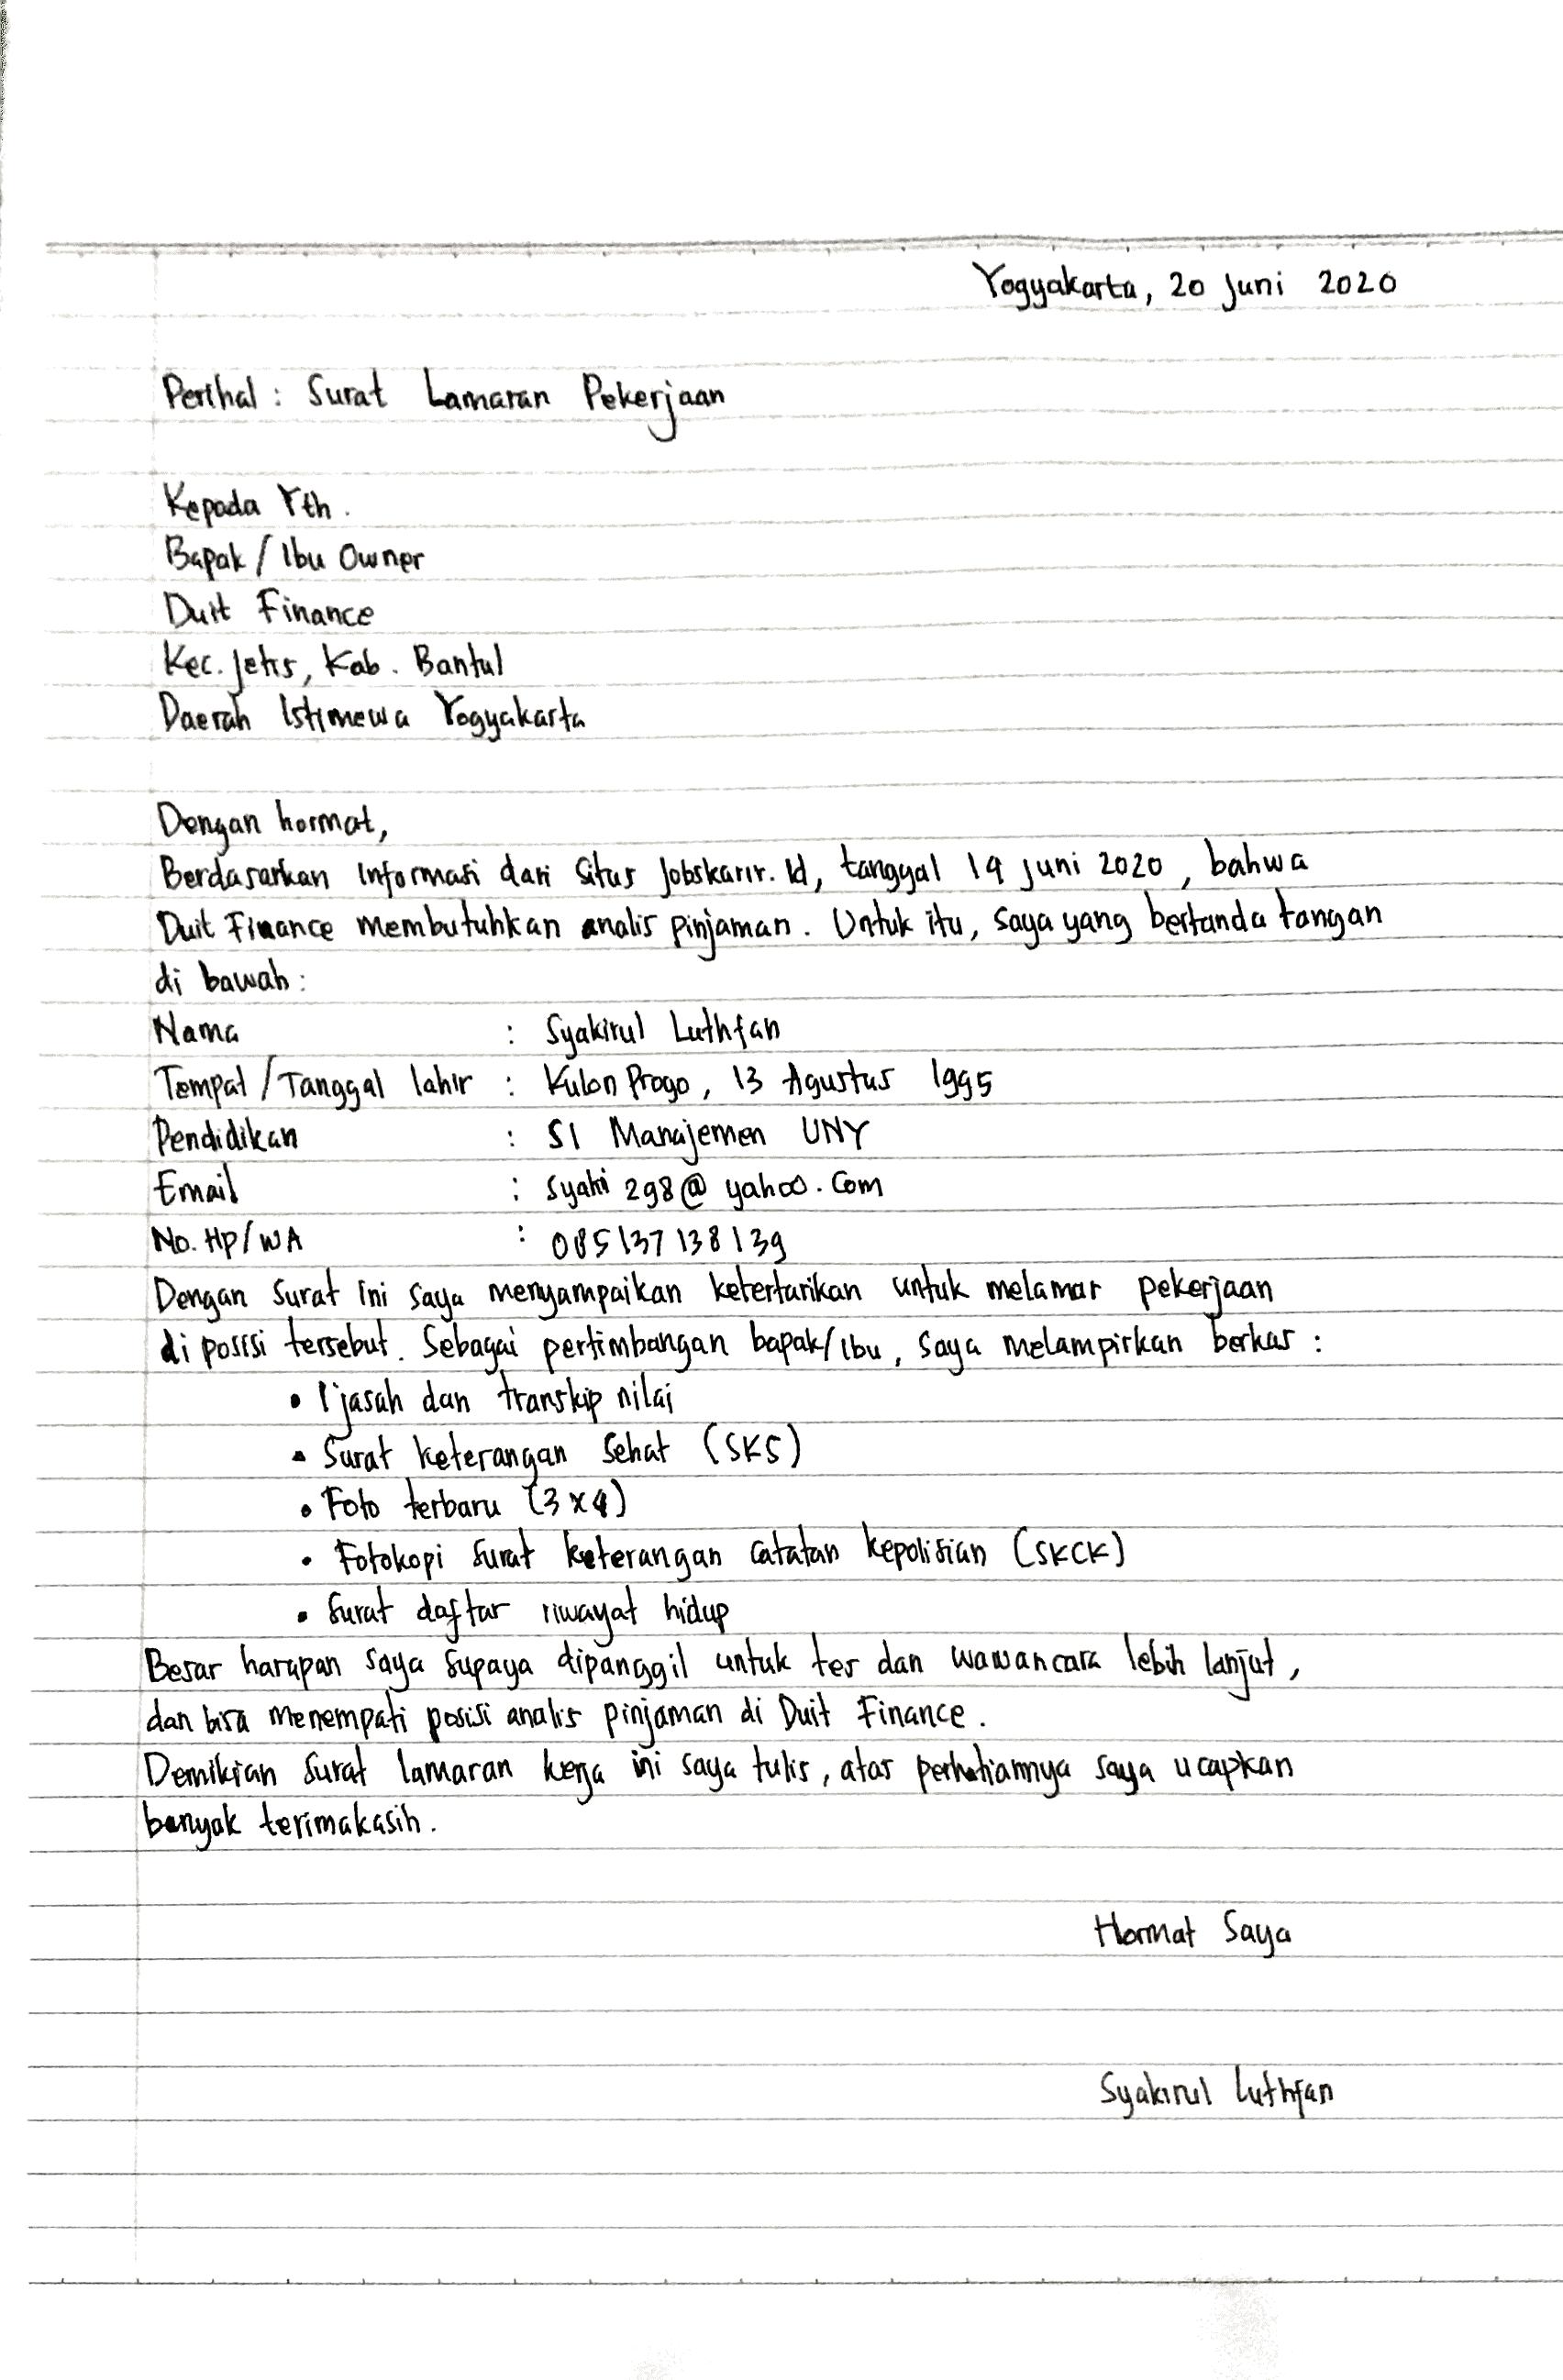 contoh surat lamaran kerja tulis tangan analis pinjaman